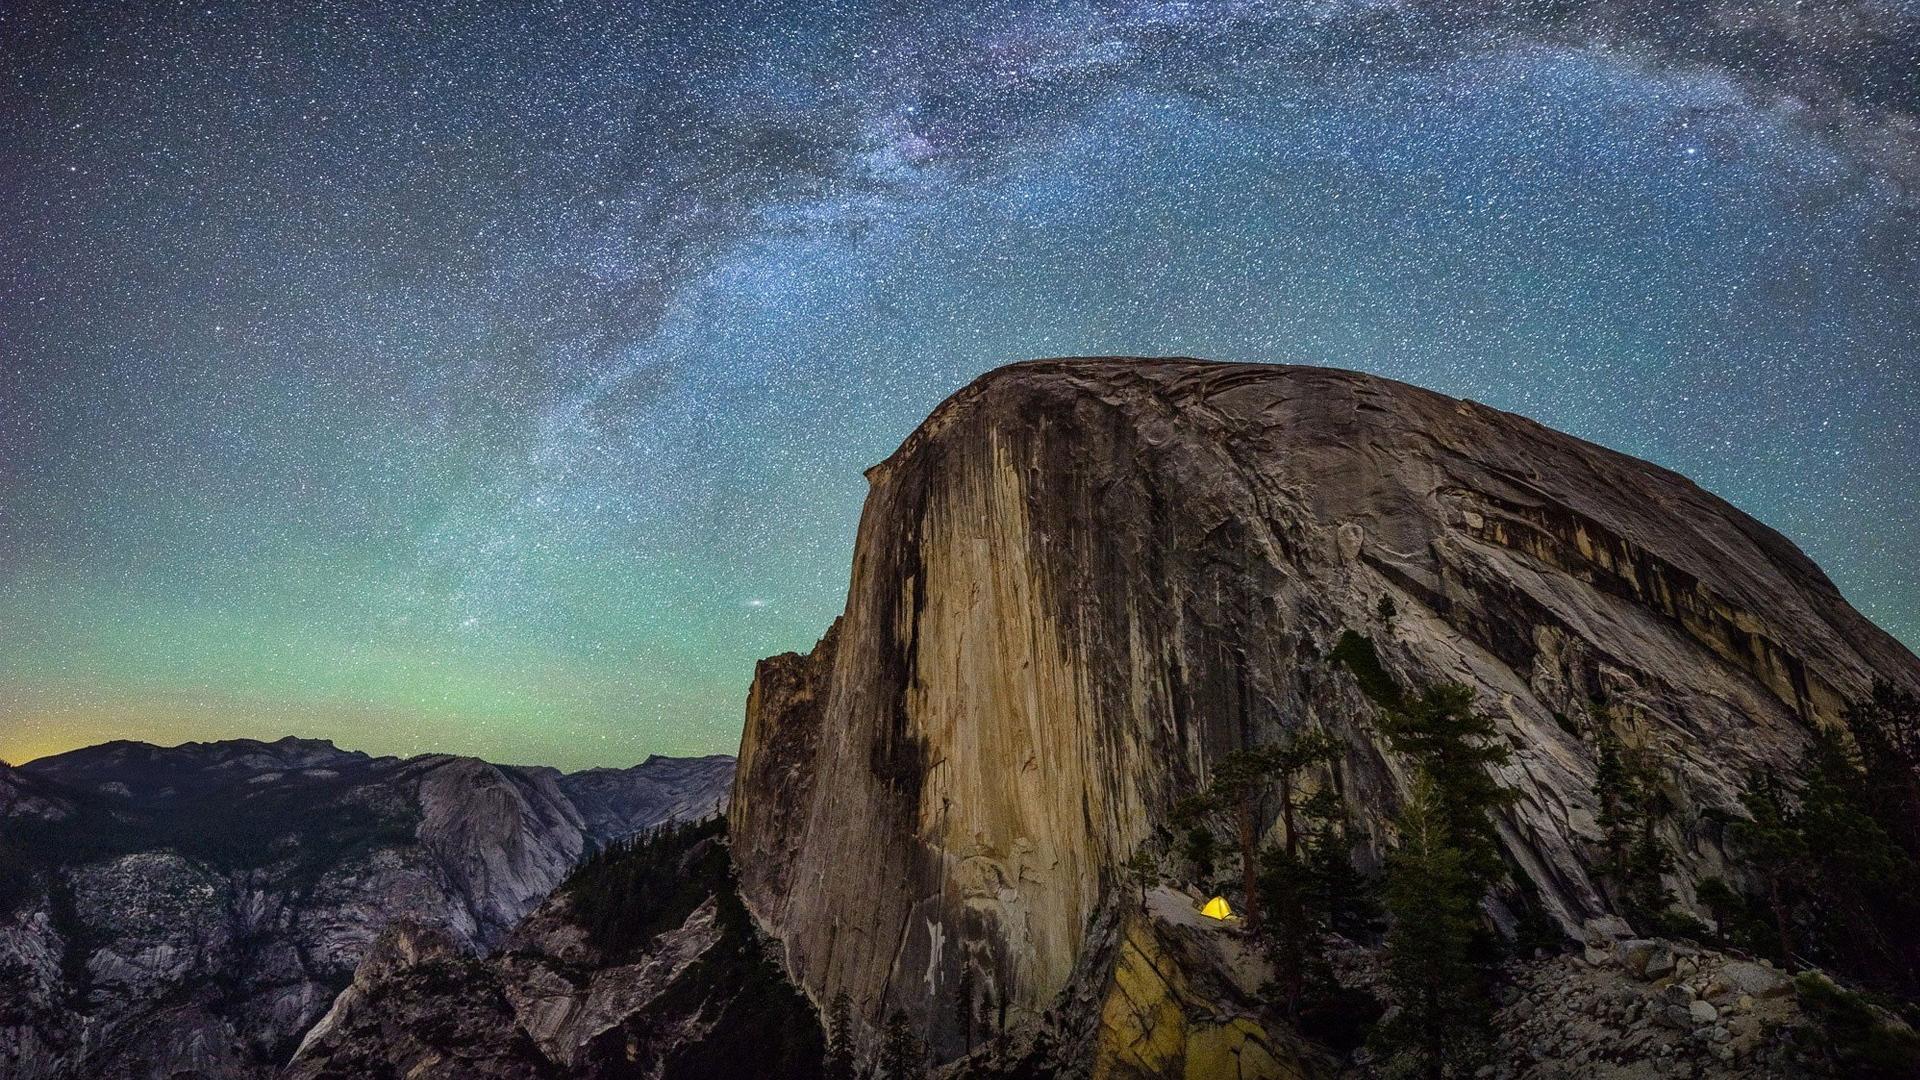 download Yosemite Camp 1080p Wallpaper New HD Wallpapers 1920x1080